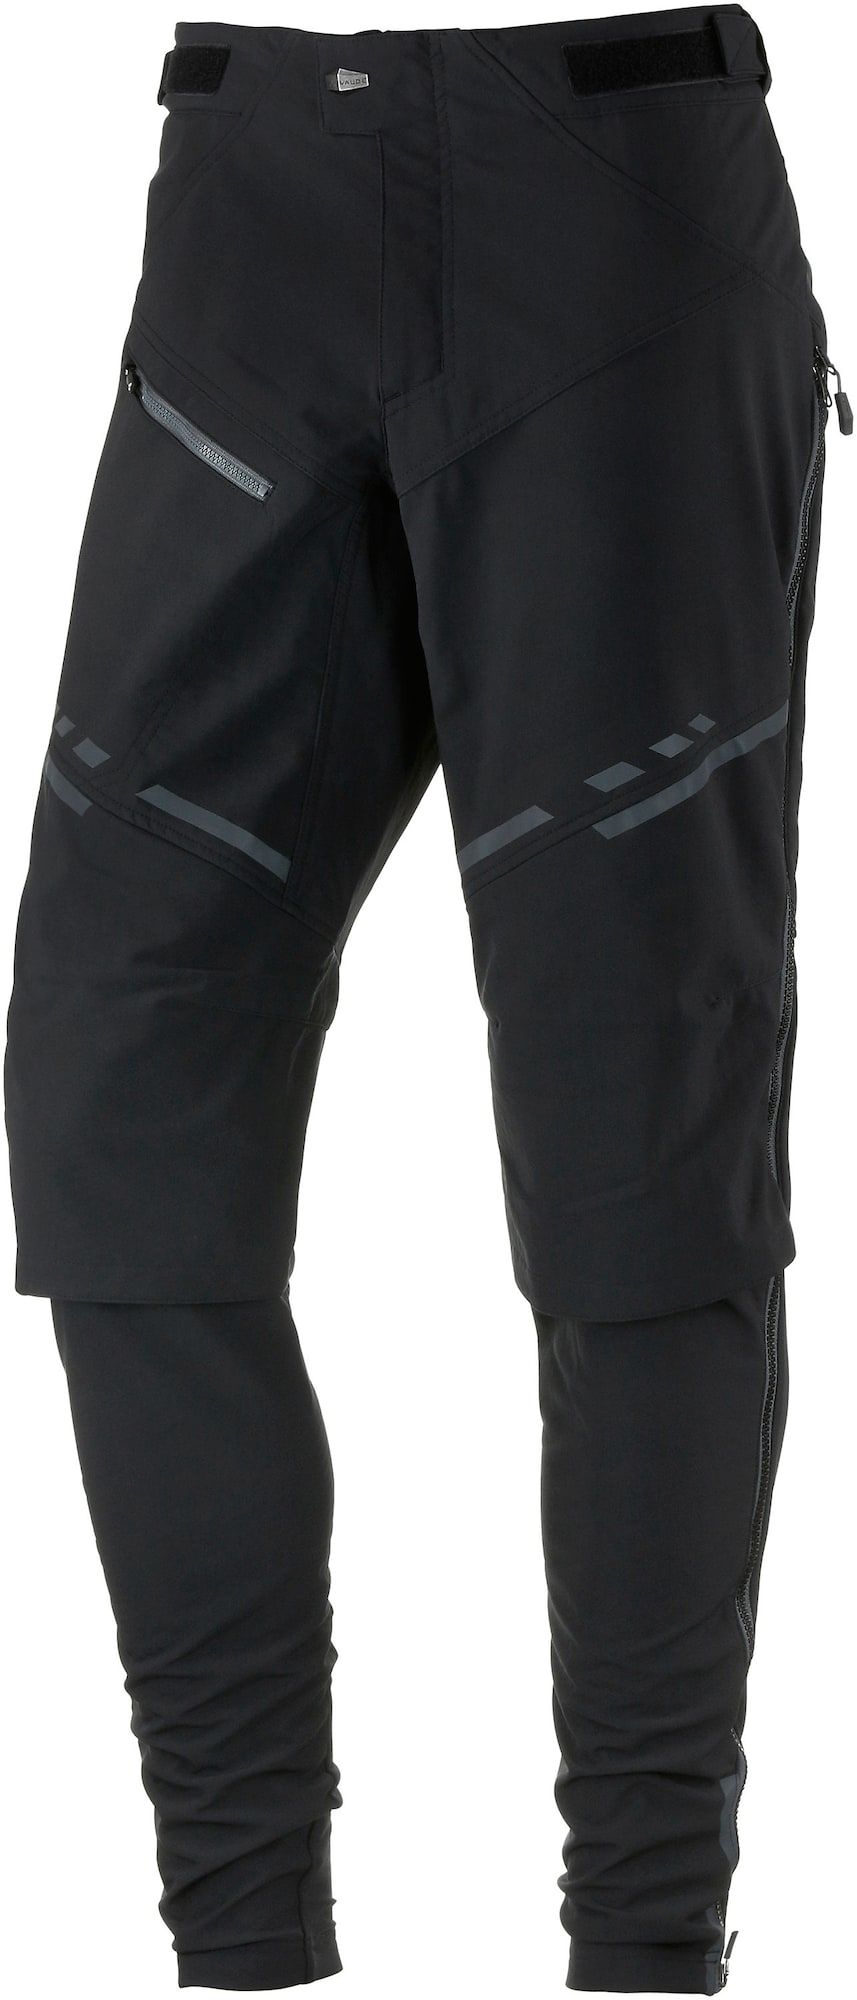 Virt Softshellhose   Sportbekleidung > Sporthosen > Softshellhosen   Vaude